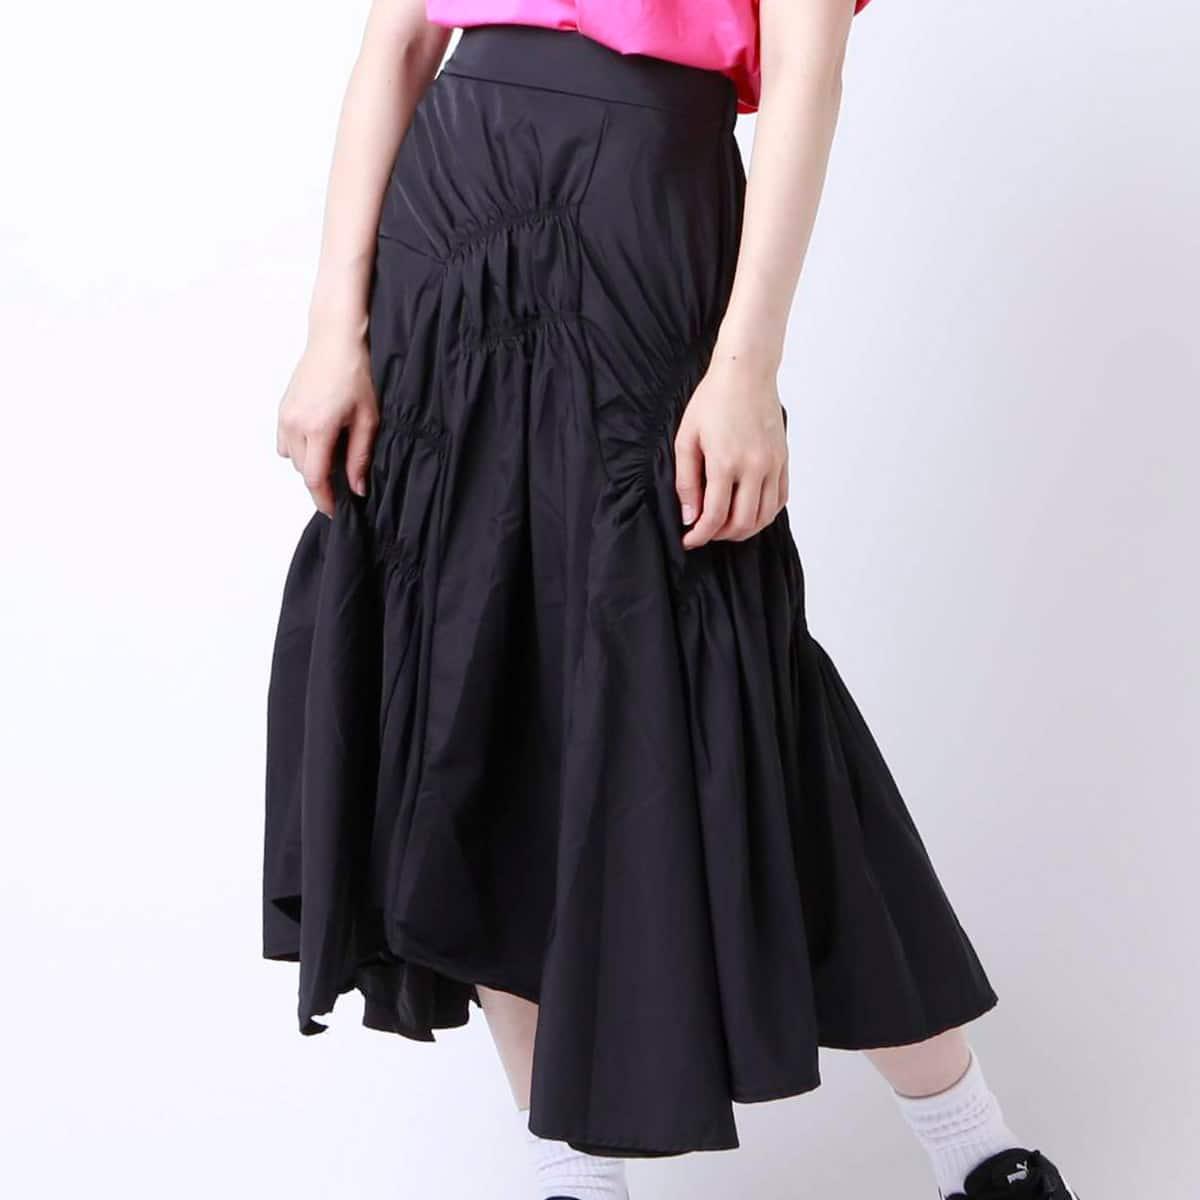 atmos pink しぼりテクスチャー ロングスカートTX BLACK 19SU-I_photo_large